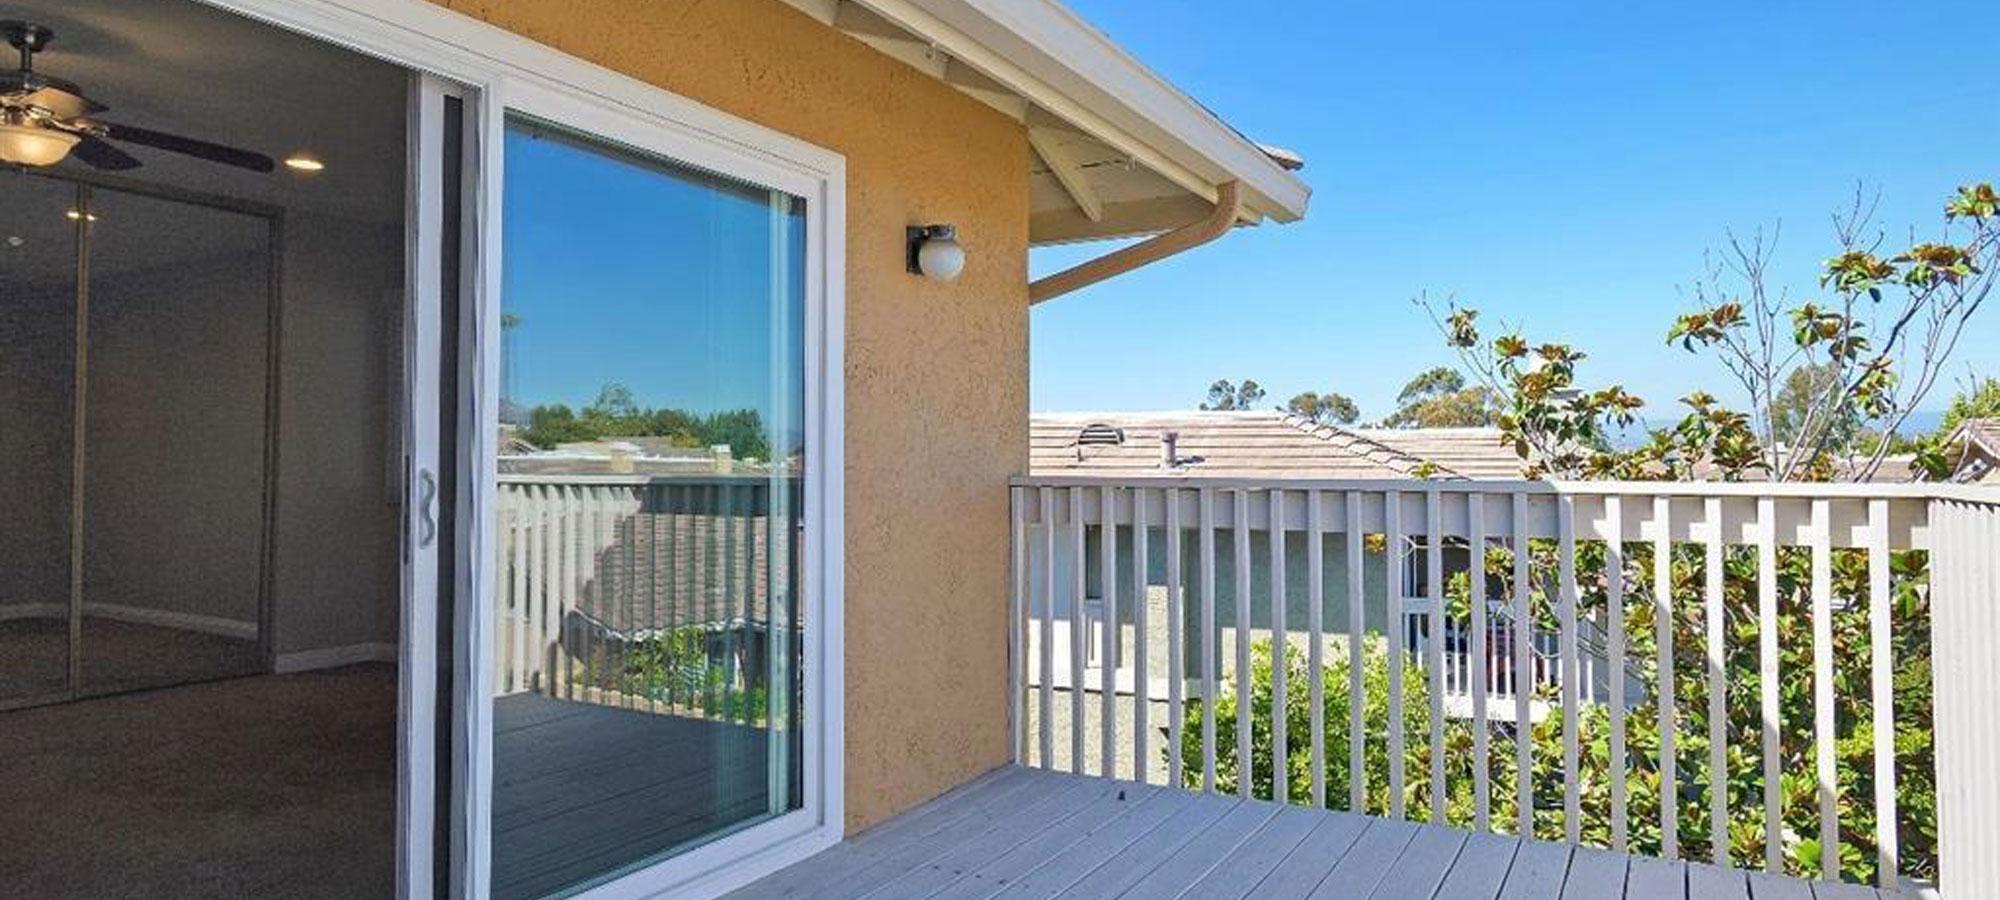 17494 Ashburton Rd San Diego, CA 92128